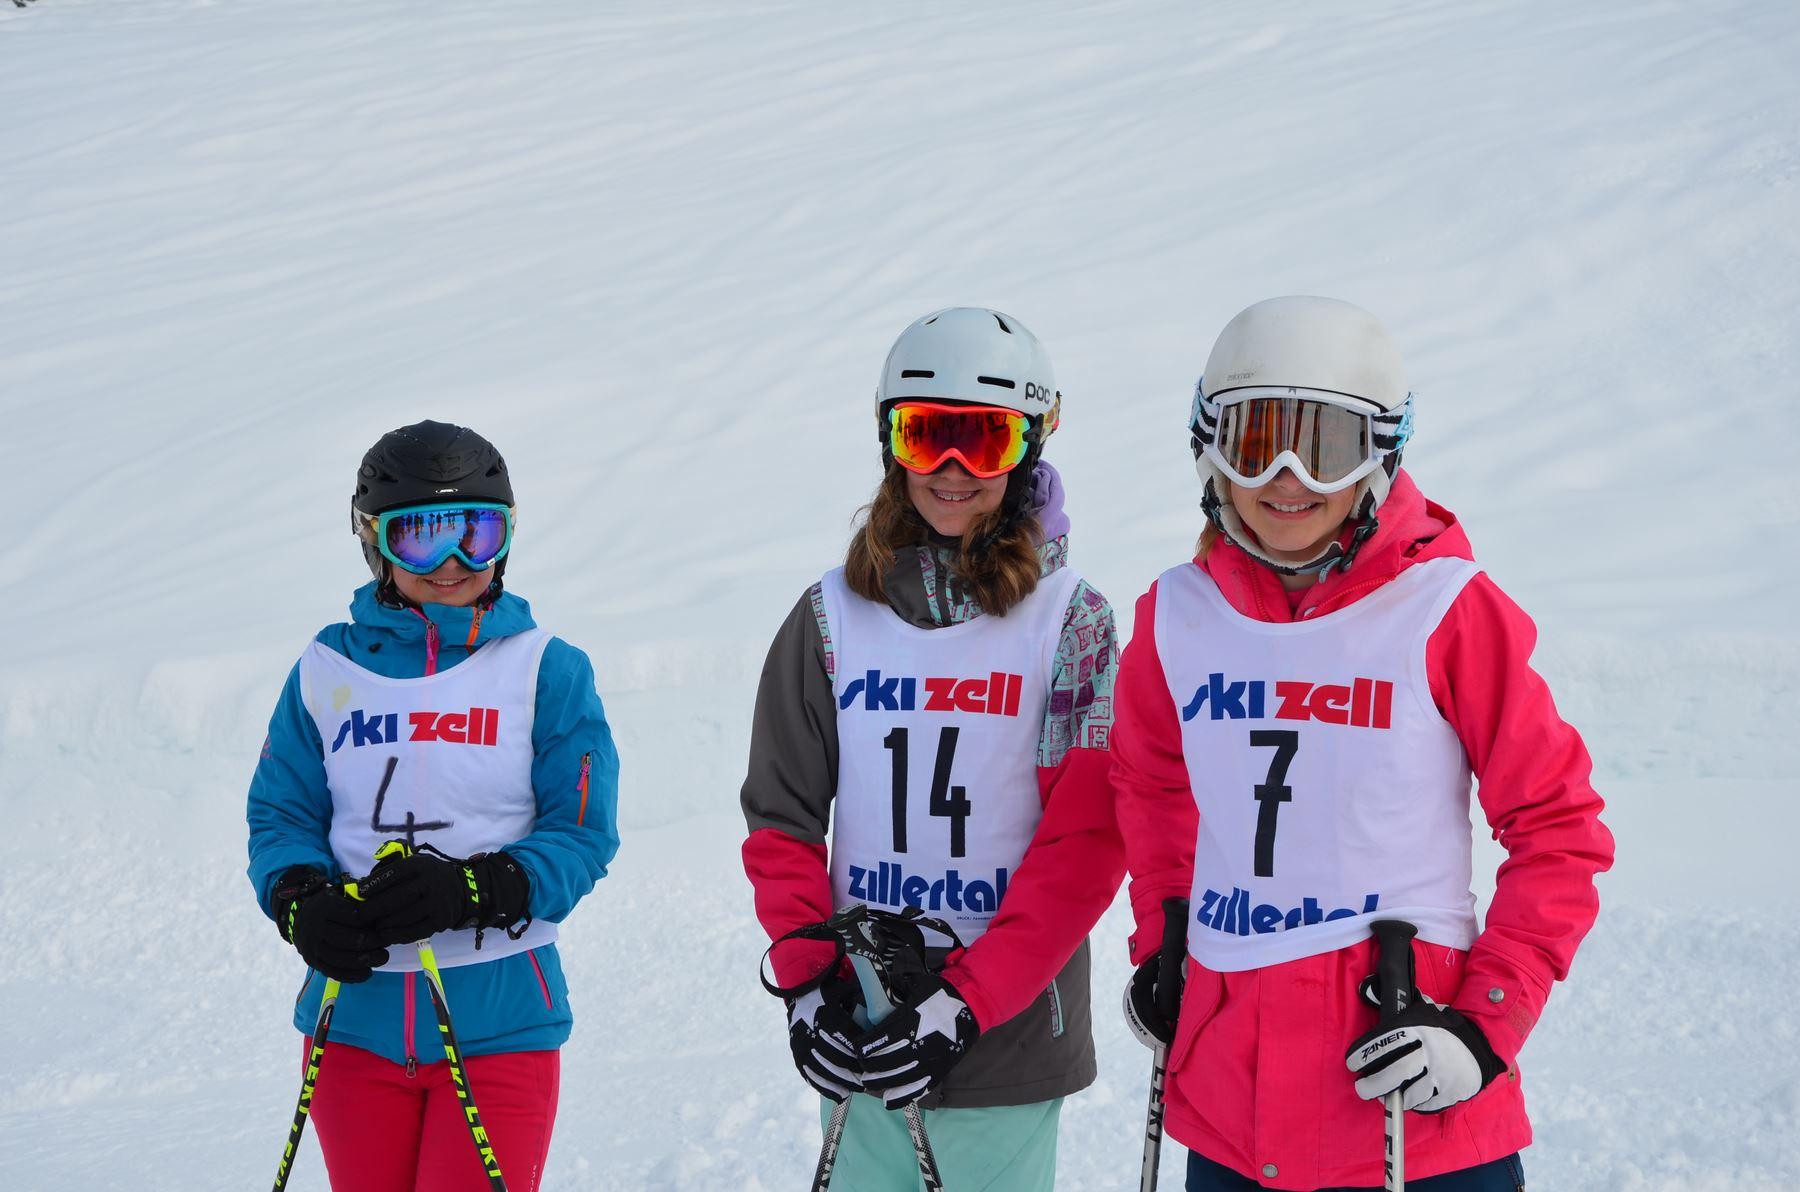 2015-03-22 BV Zillertal Skirennen 026.JPG